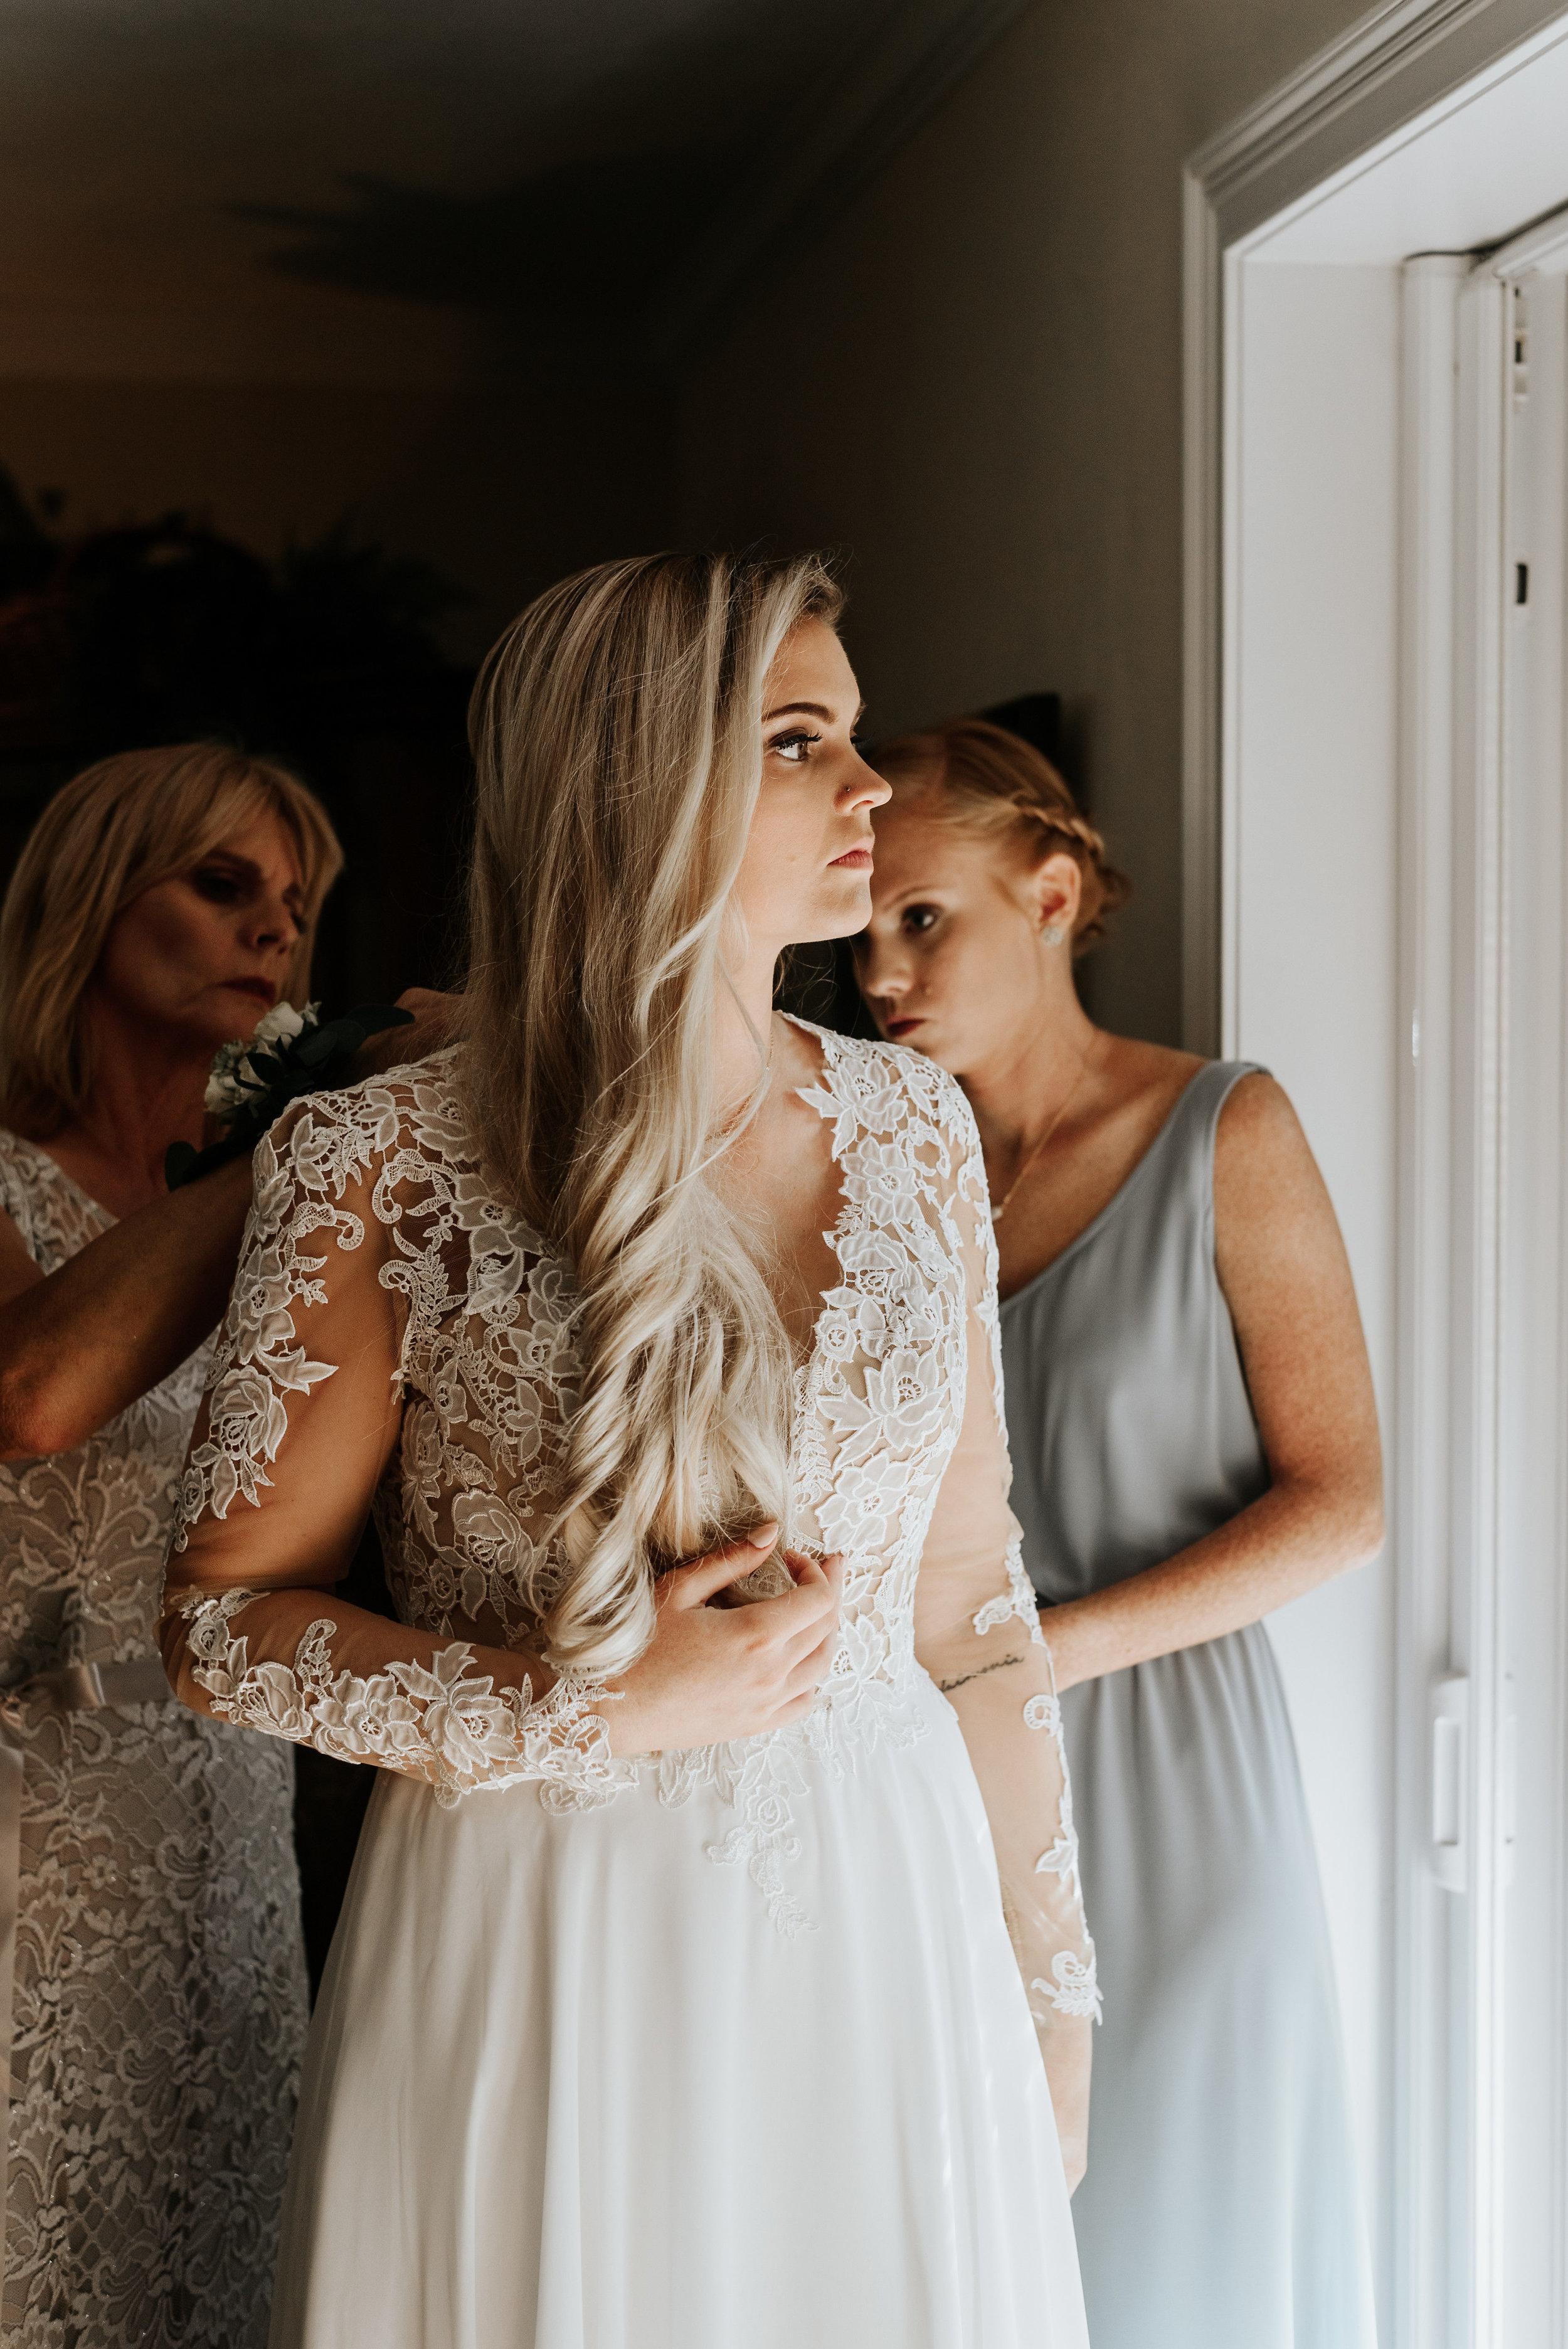 Mikenzi_Brad_Wedding_The_Delamater_House_New_Smyrna_Beach_Florida_Photography_by_V_4459.jpg